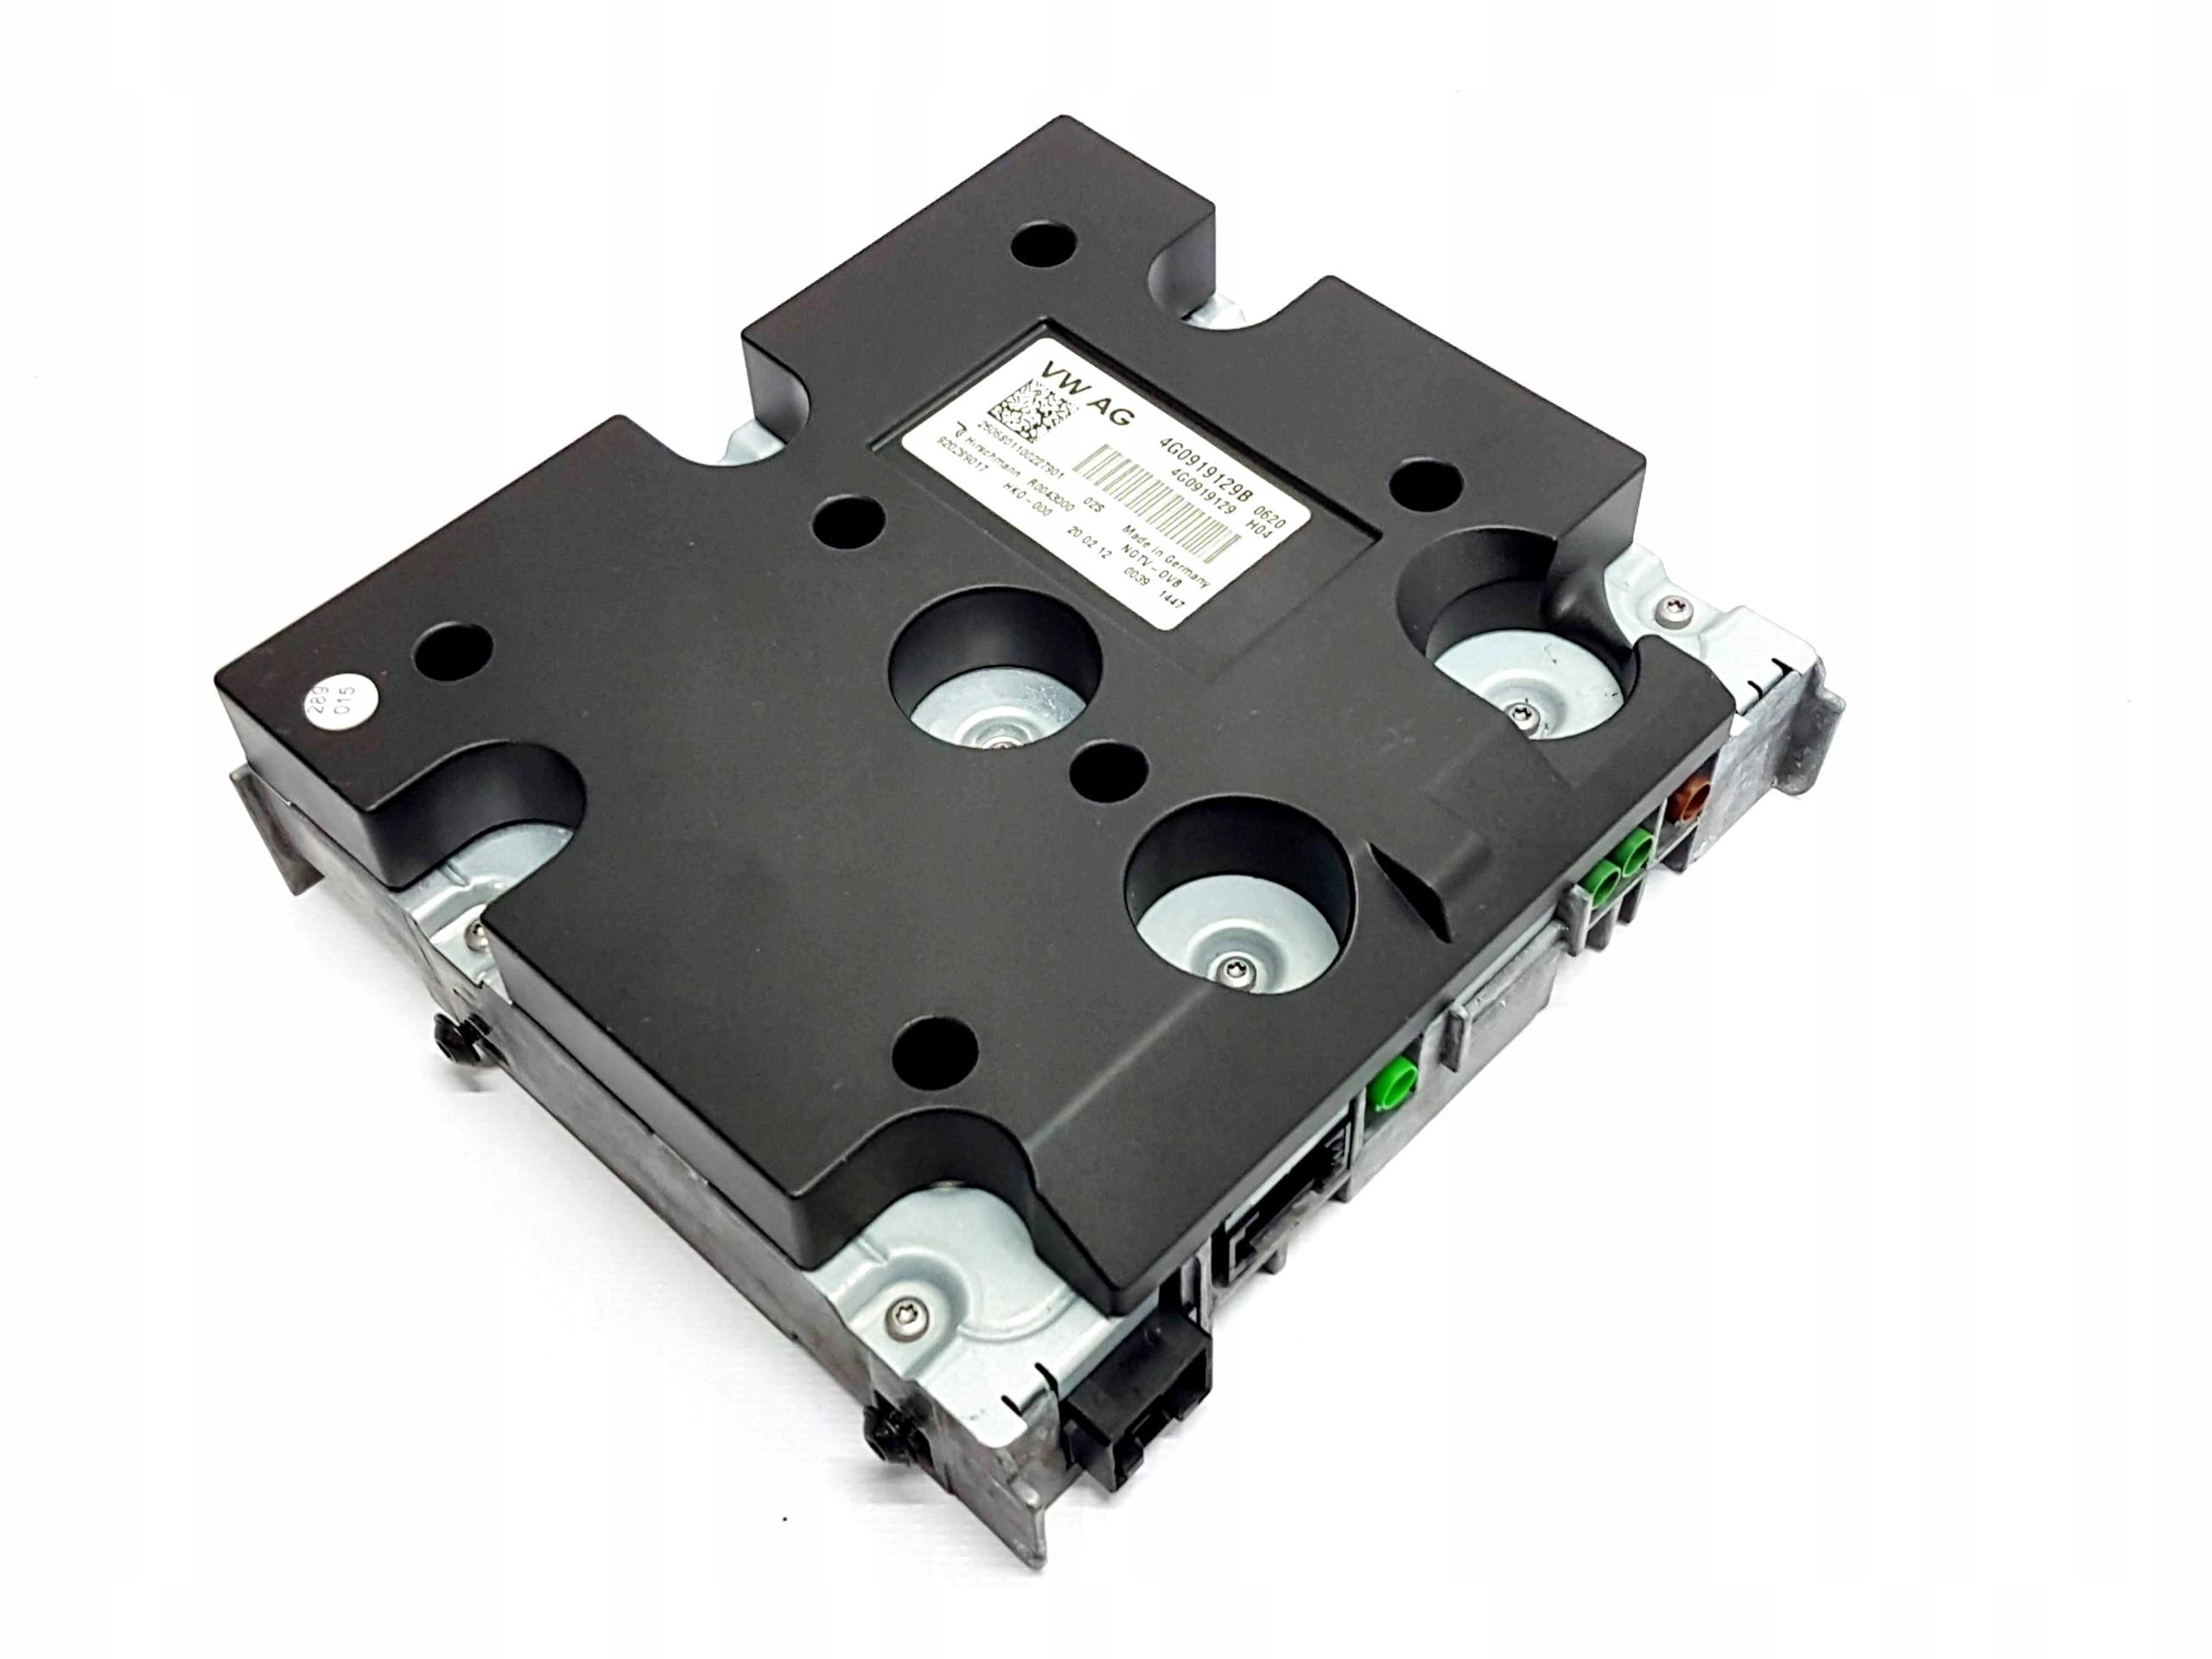 Cyfrowy tuner TV DVB-T Audi A5 A6 Q5 4G0919129B